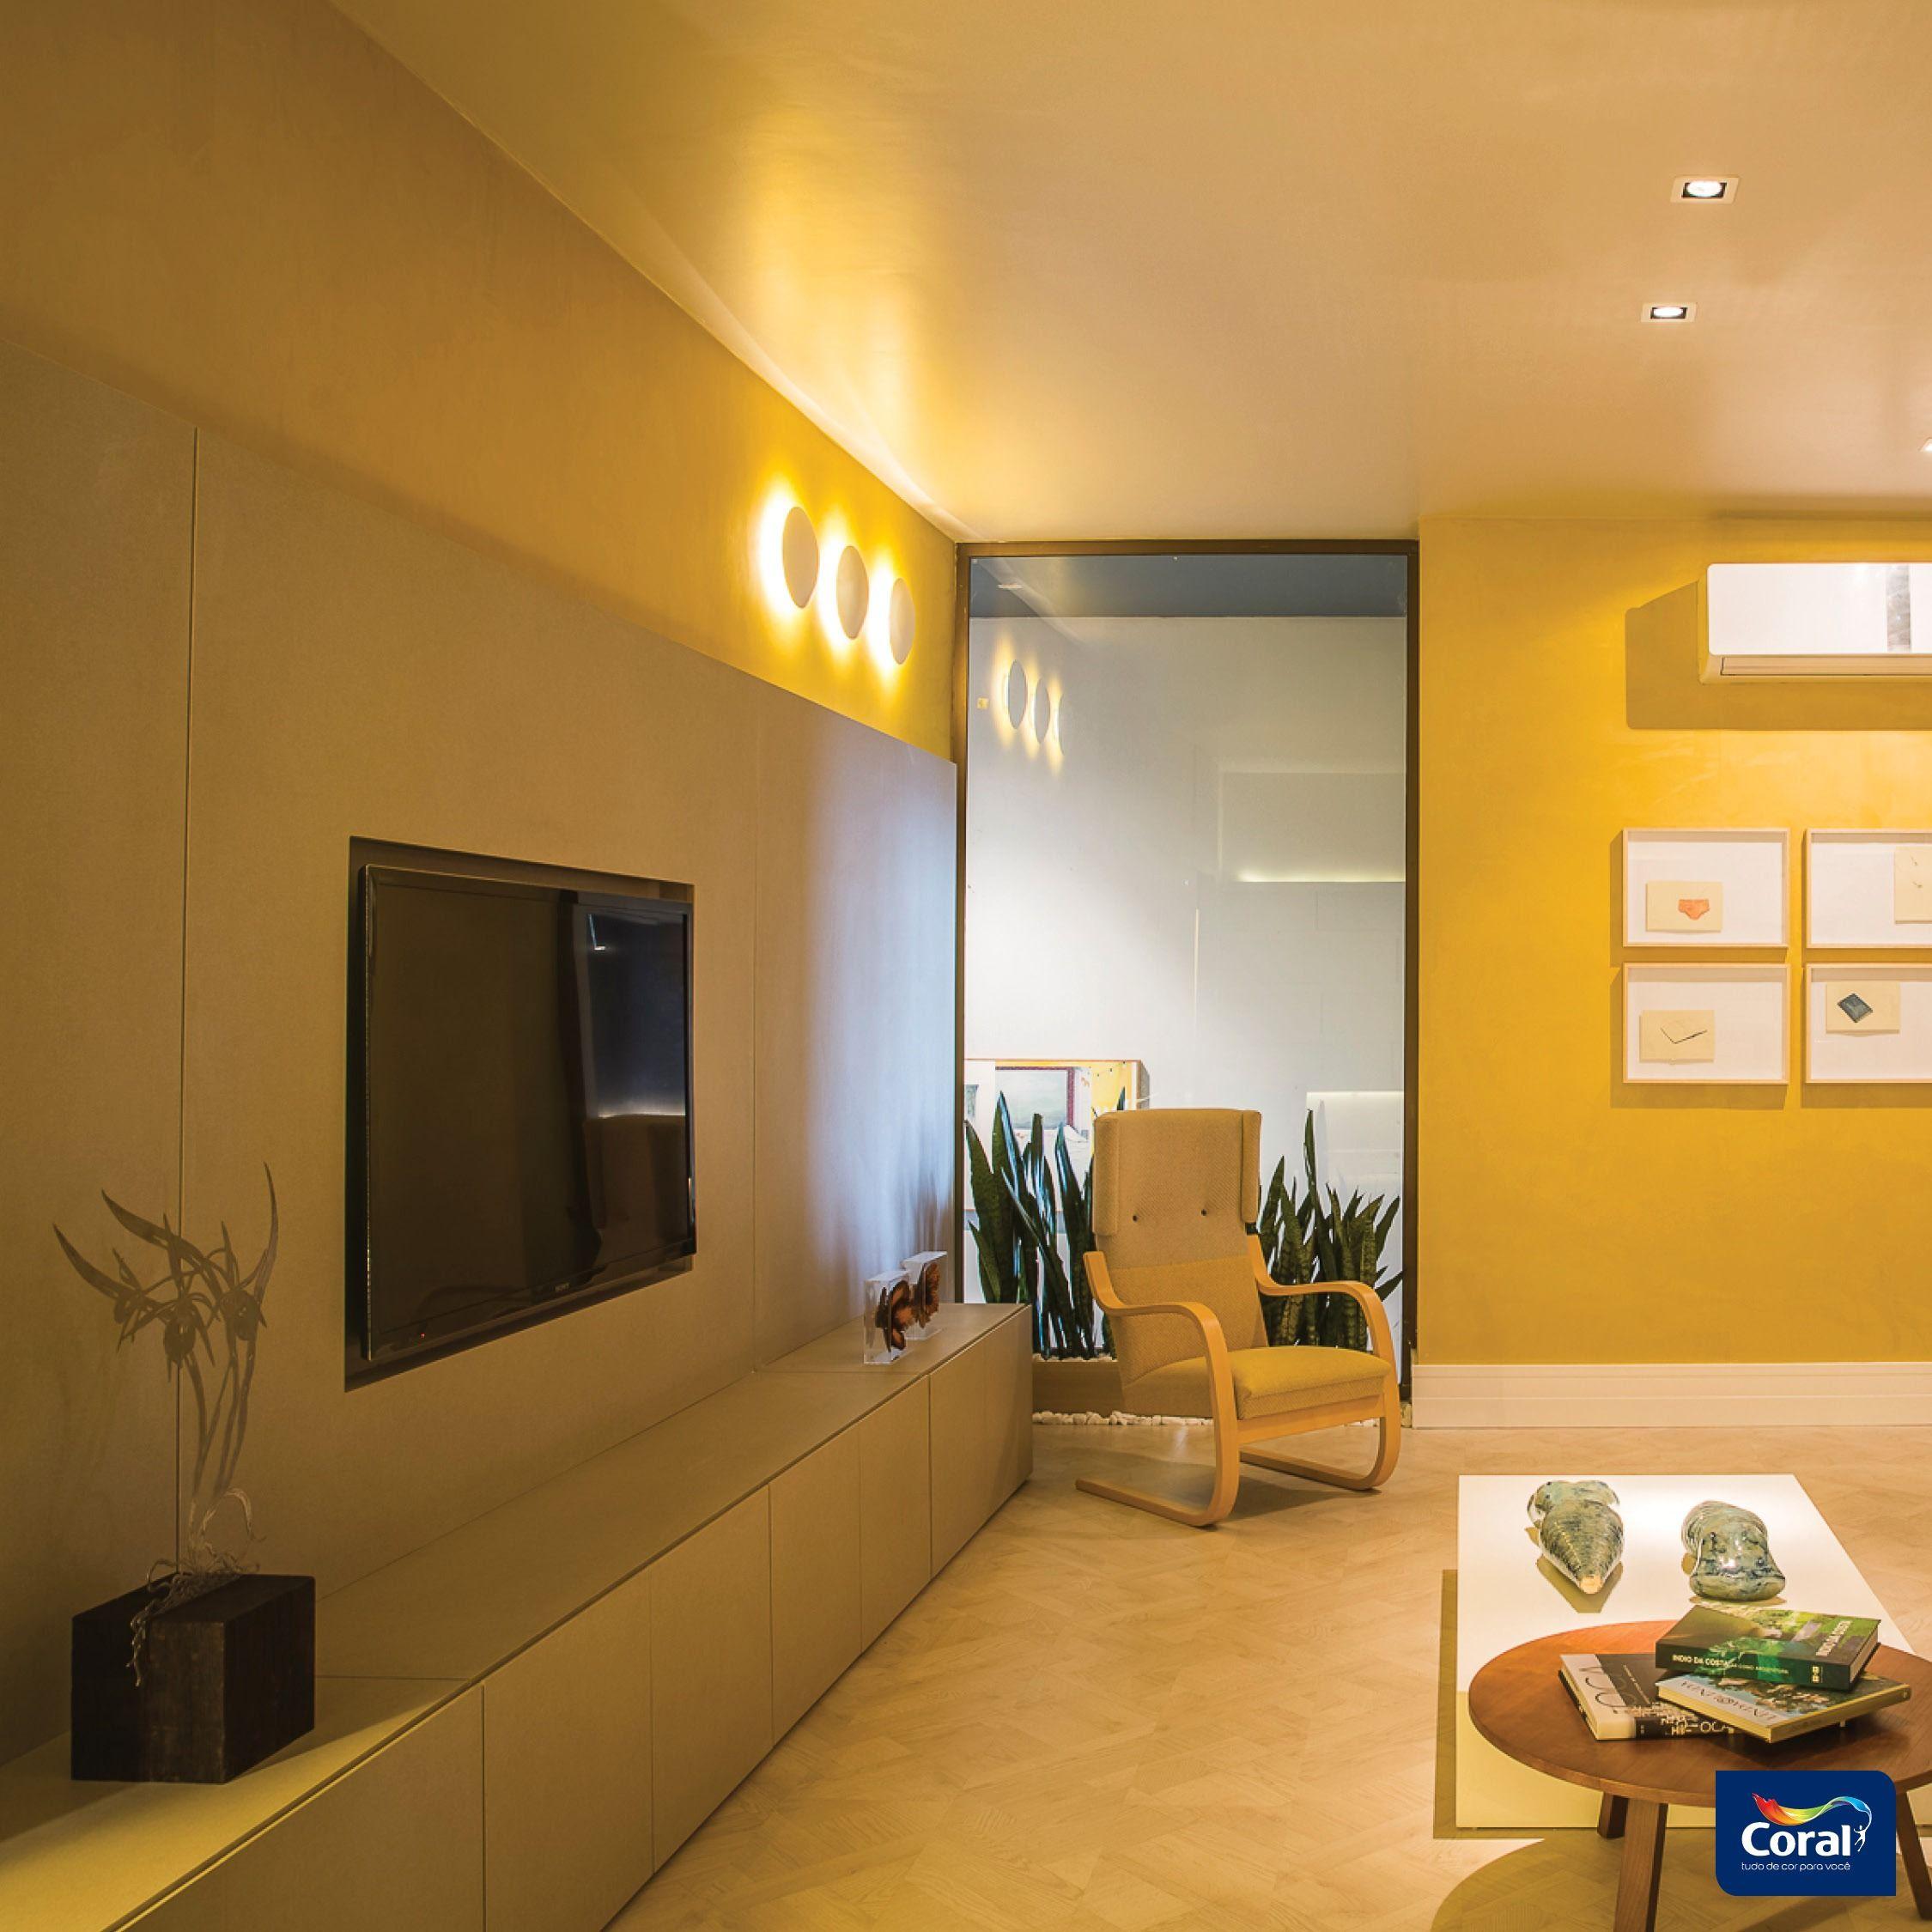 sala da familia brasileira apartamento branco coral decora interiores coral decora